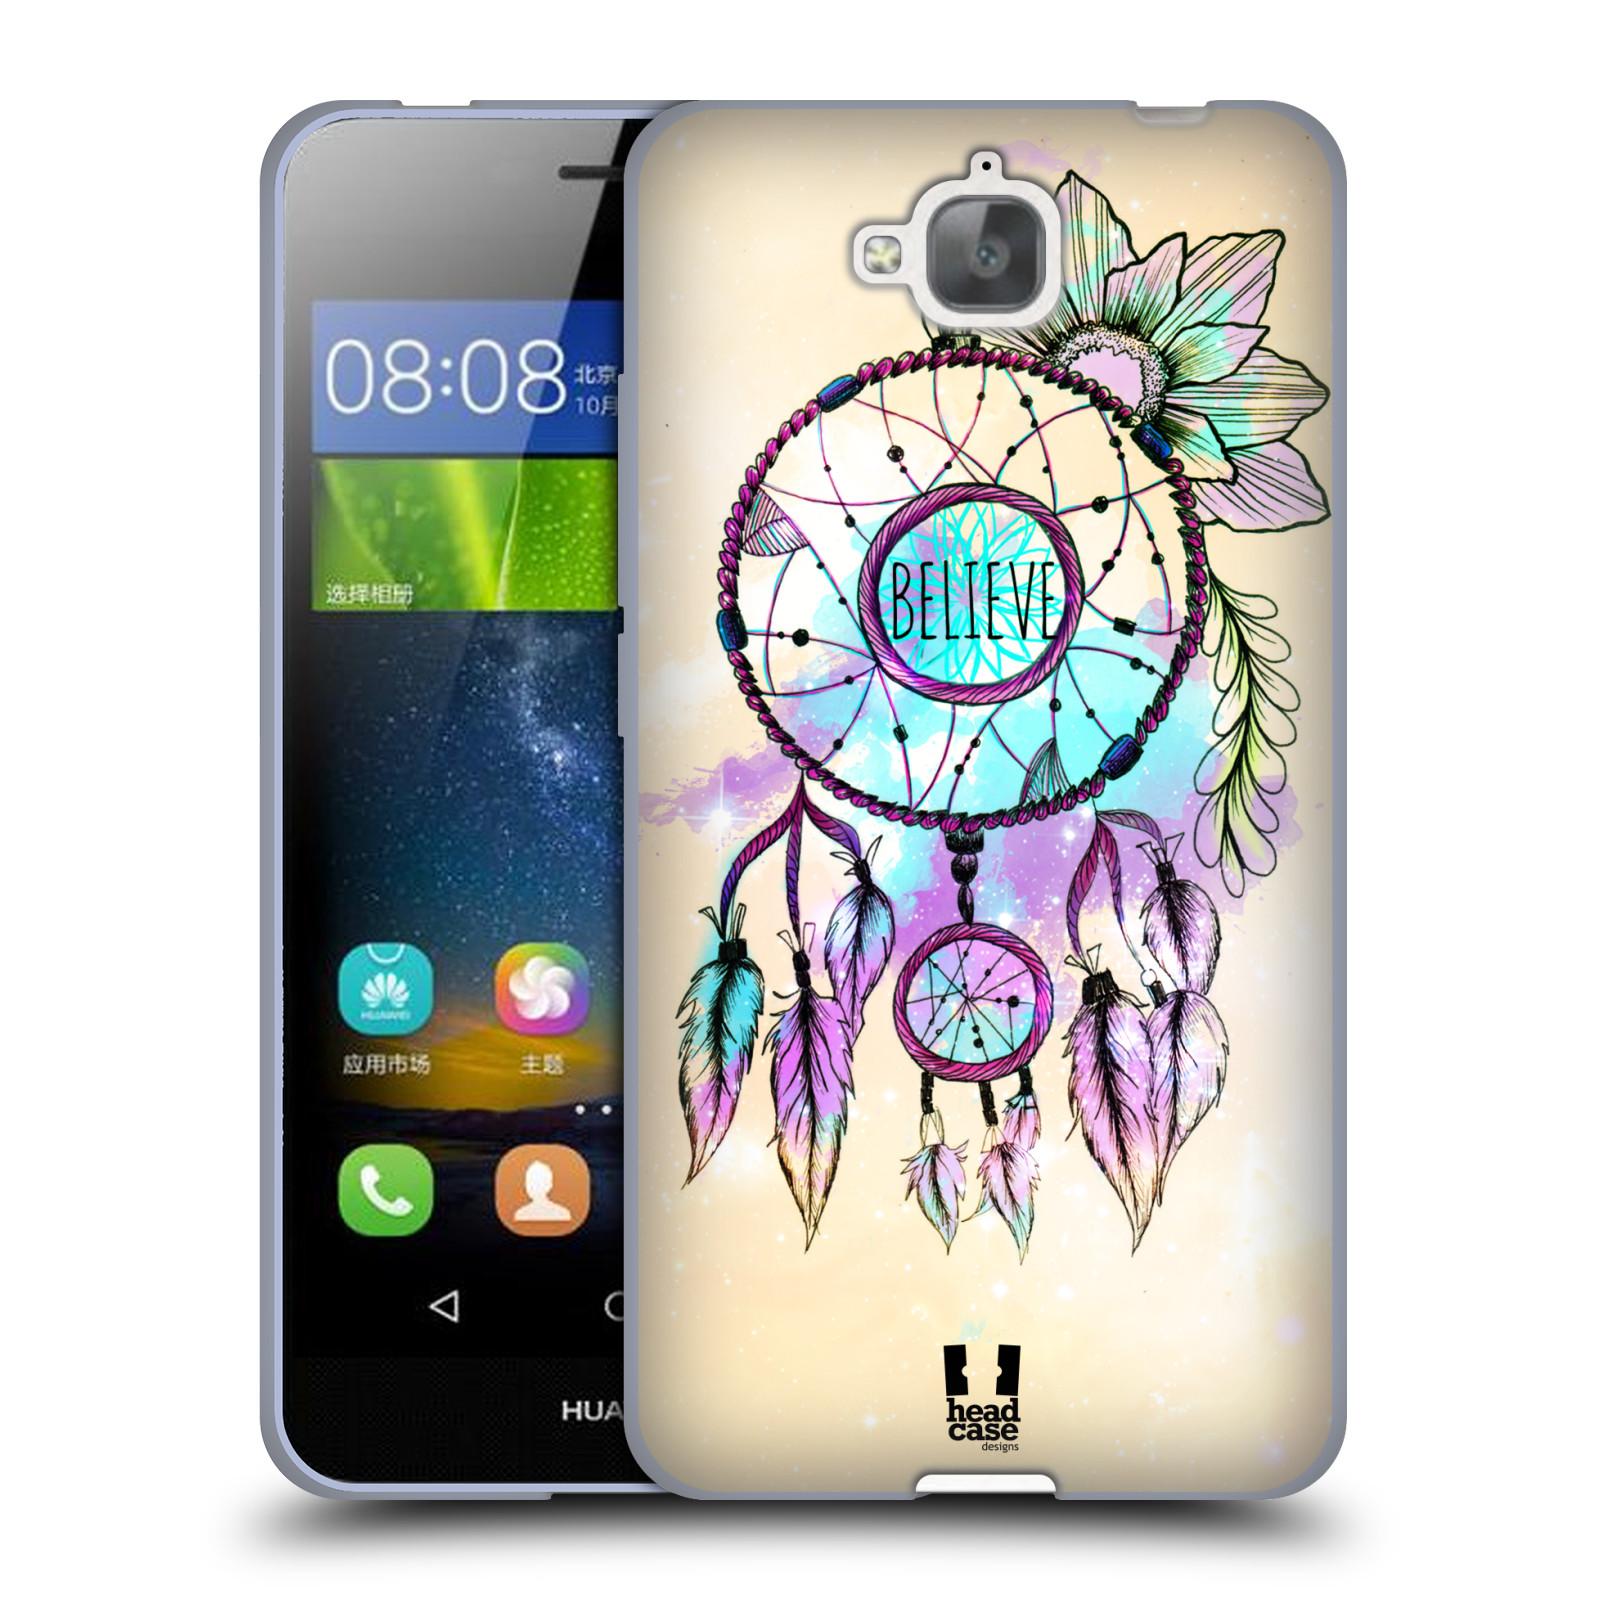 Silikonové pouzdro na mobil Huawei Y6 Pro Dual Sim HEAD CASE MIX BELIEVE